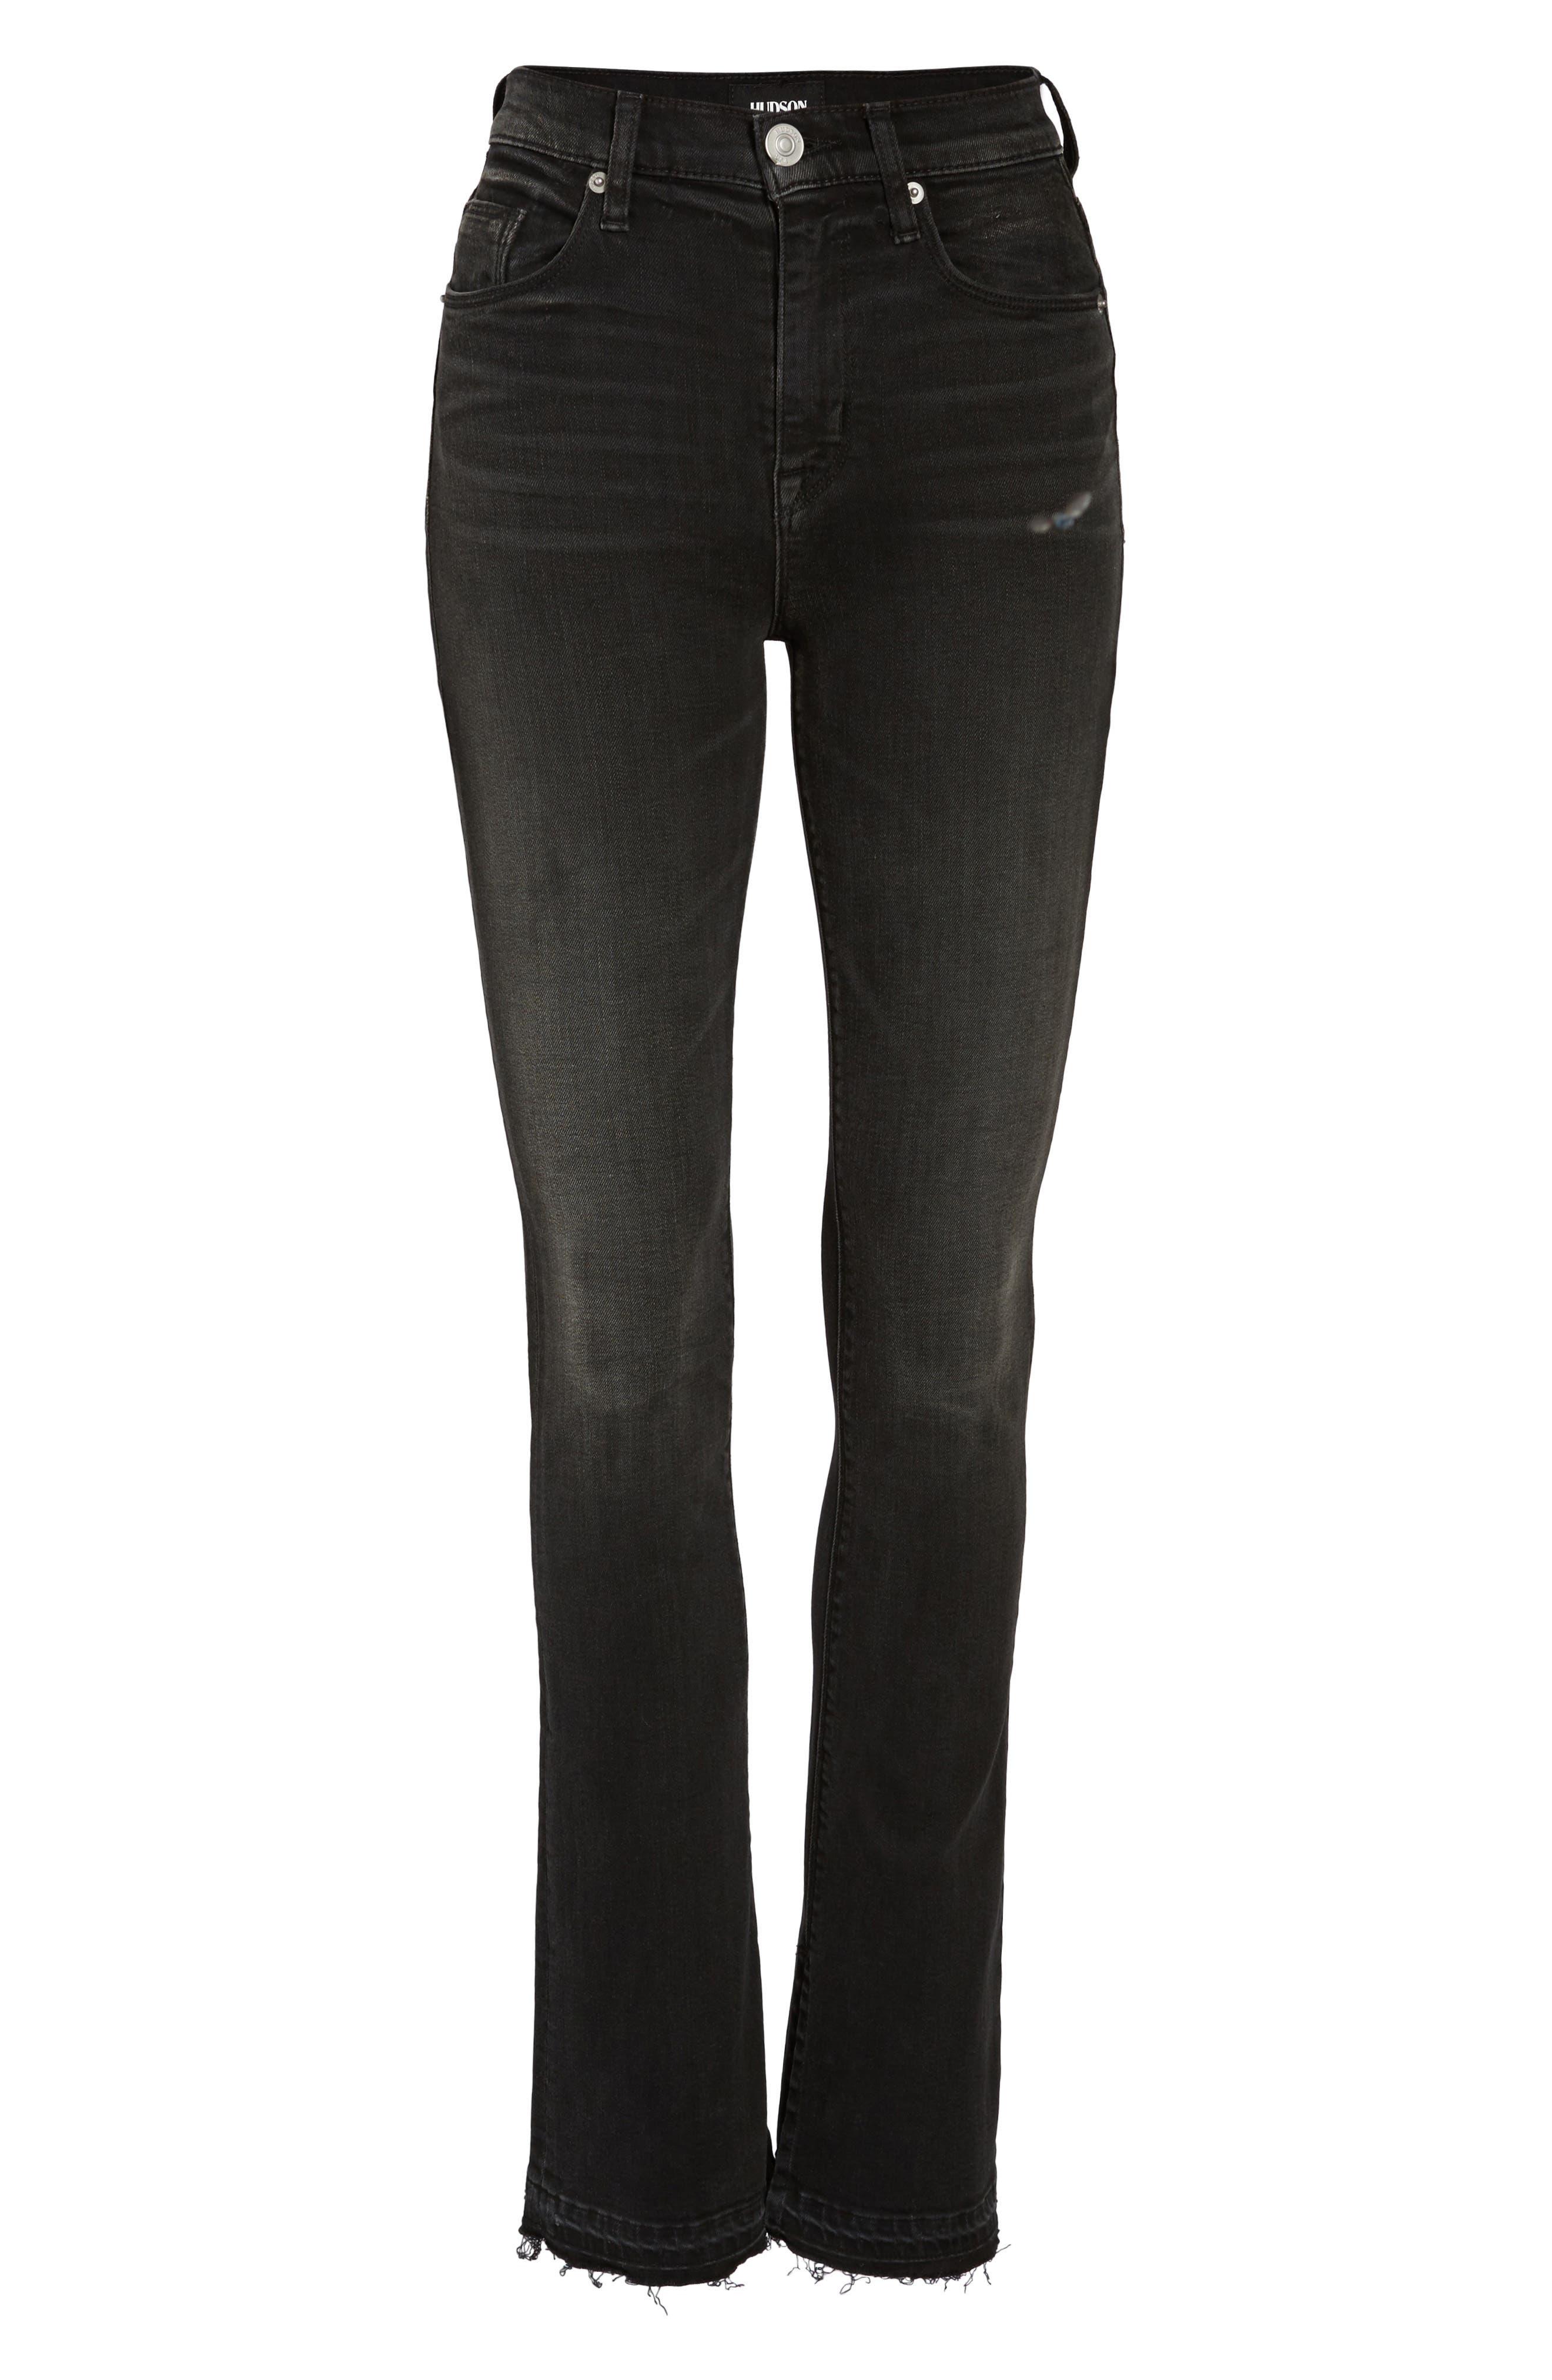 Heartbreaker High Waist Bootcut Jeans,                             Alternate thumbnail 6, color,